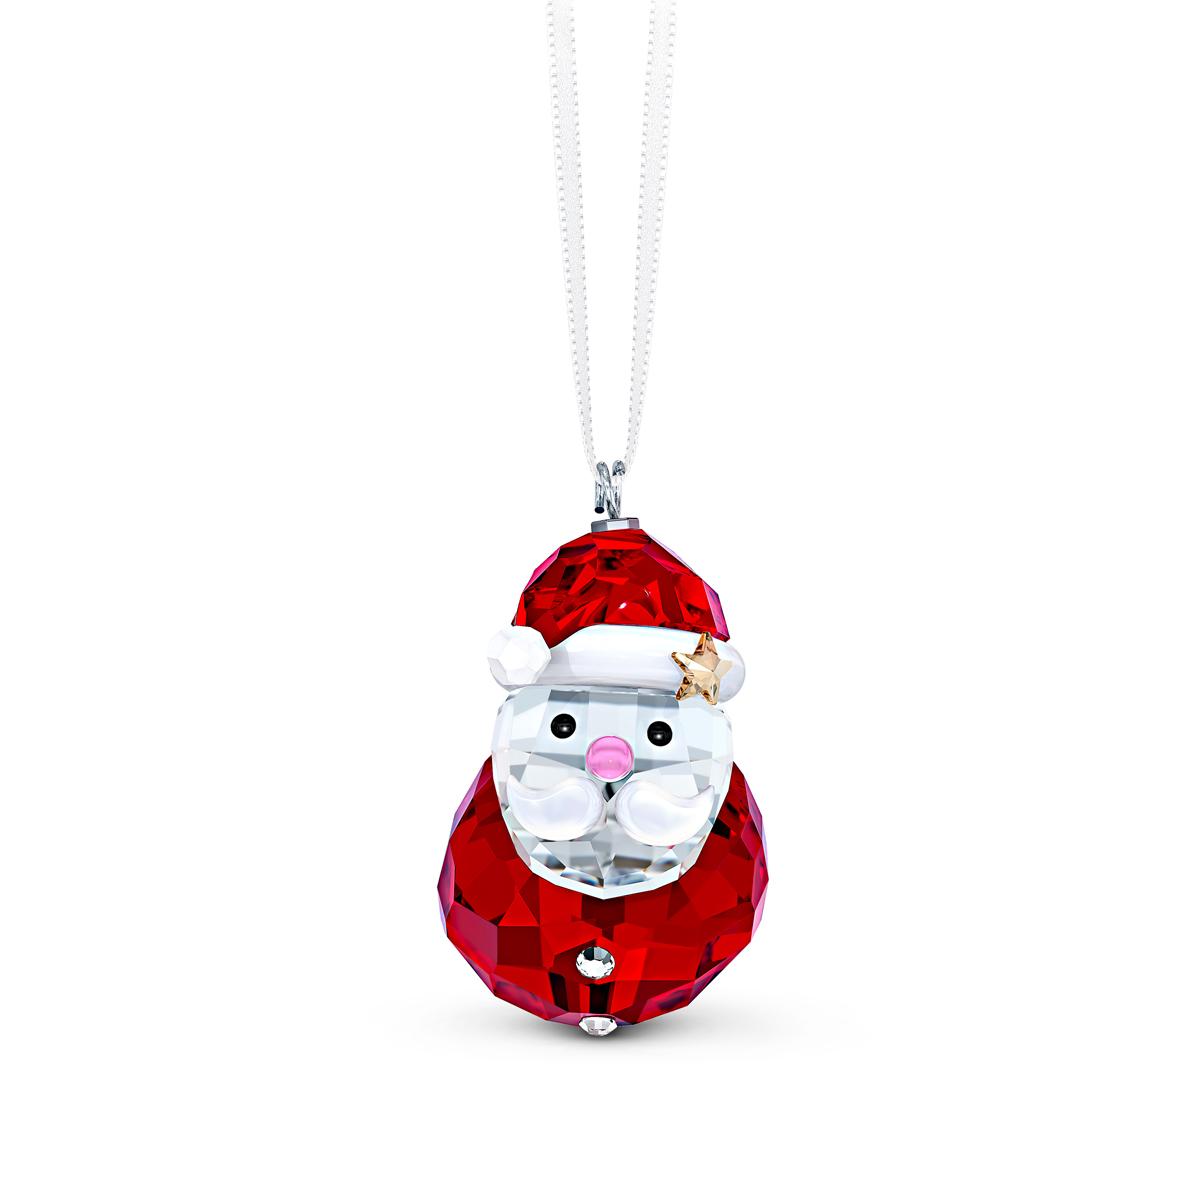 Swarovski 2020 Rocking Santa Claus Ornament